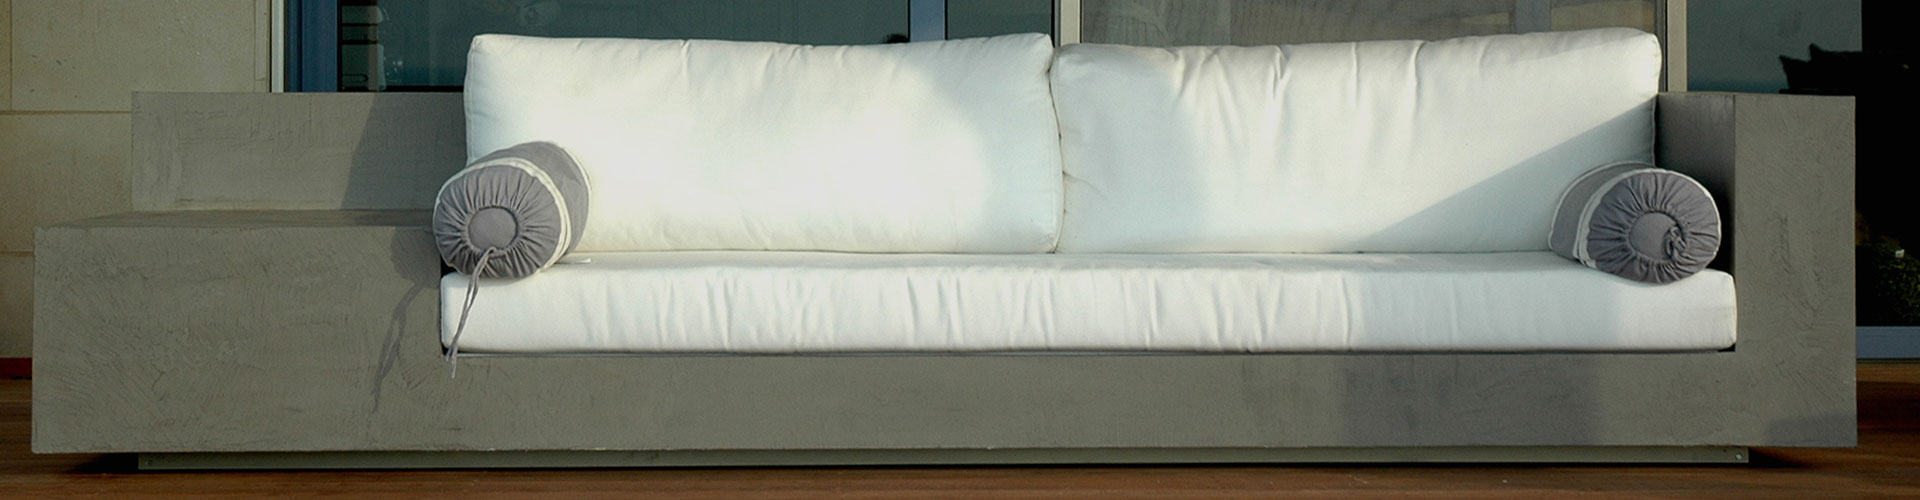 concrete-furniture_-by-BETONADA